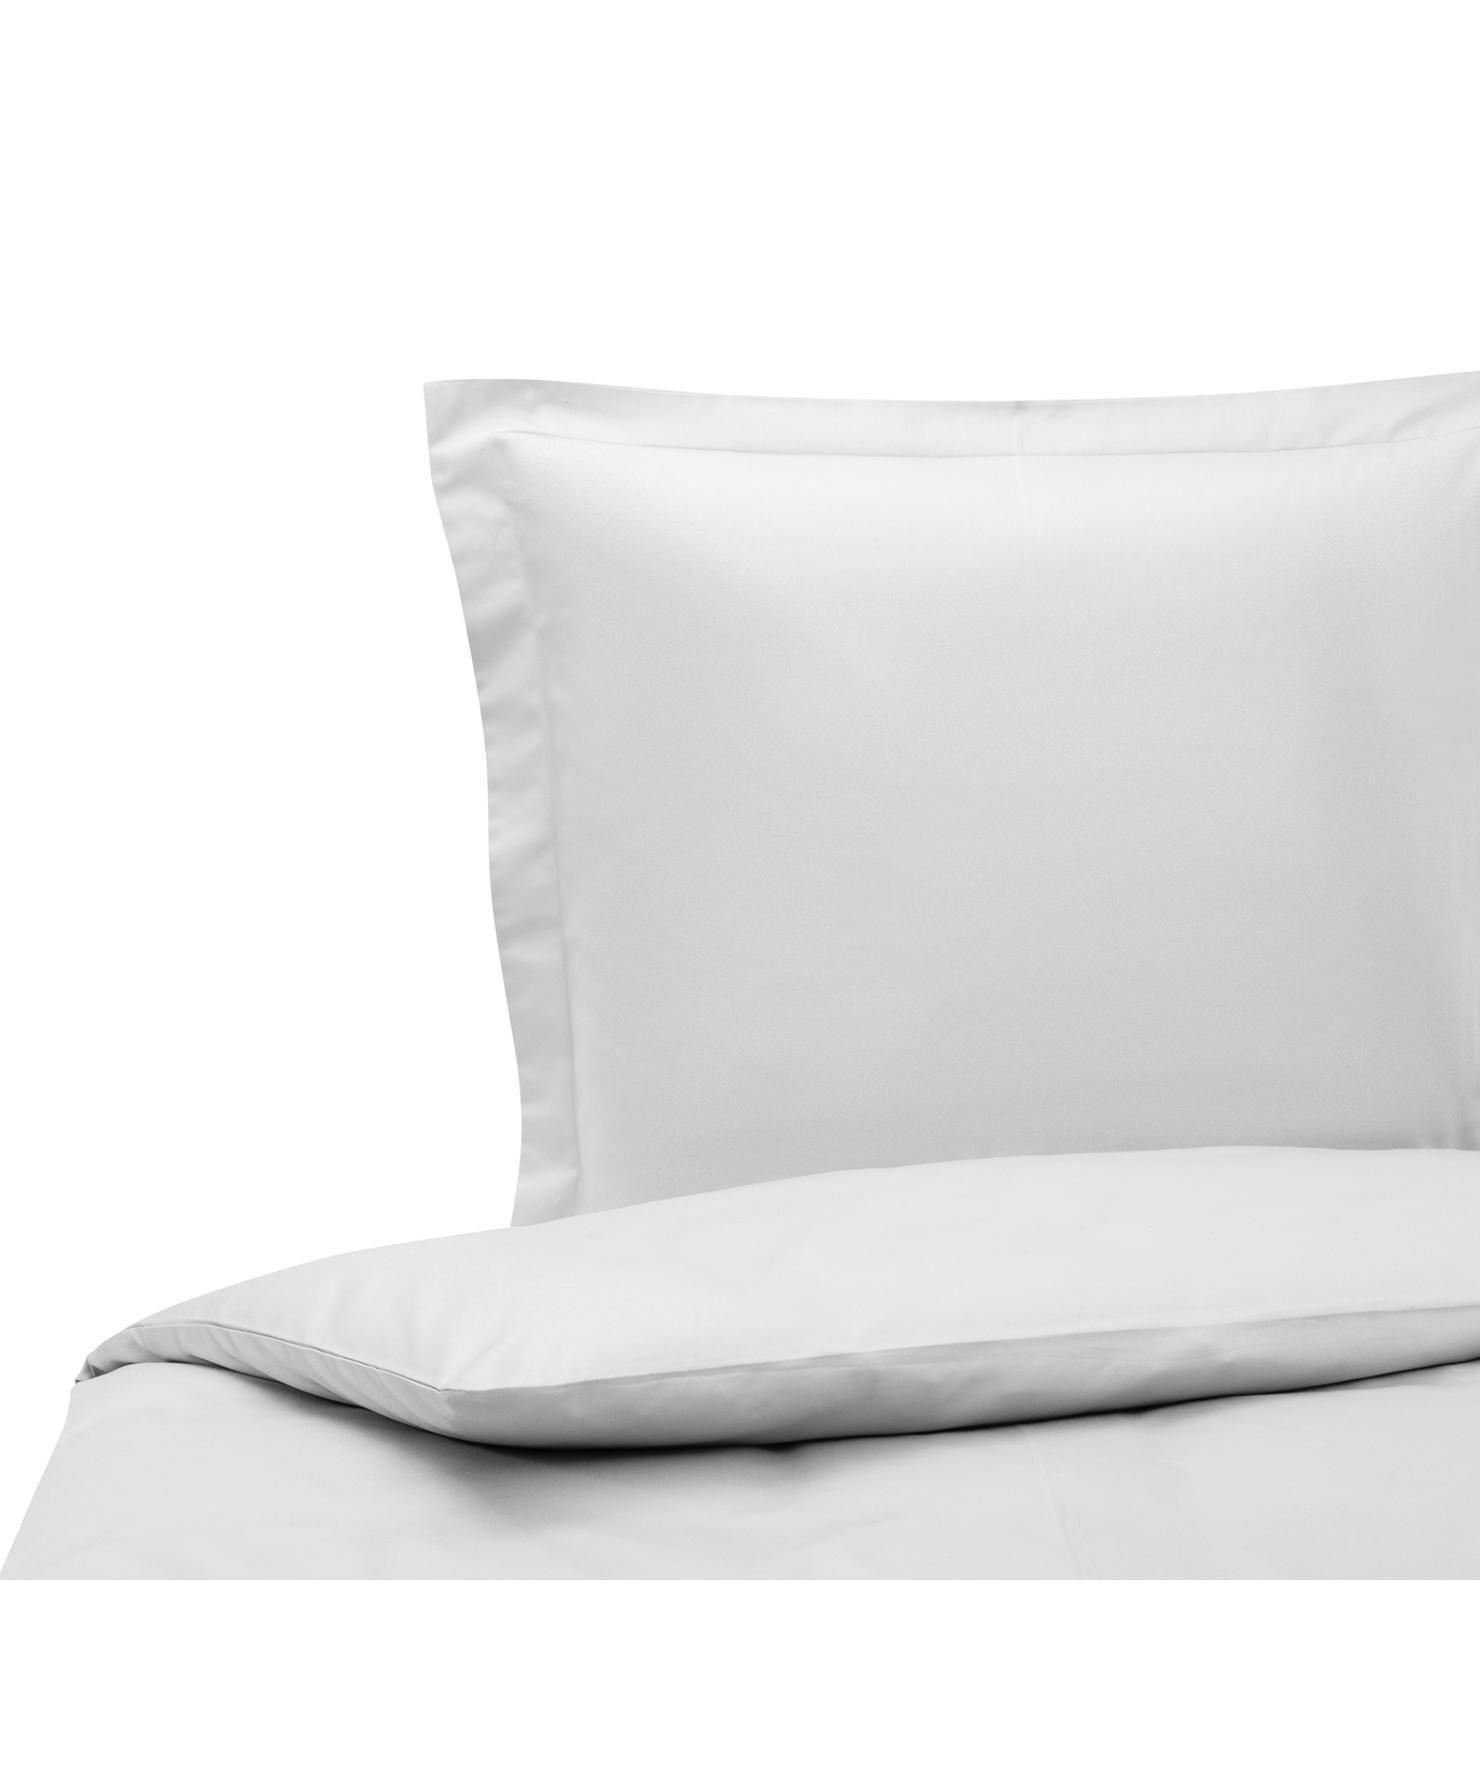 Funda nórdica de satén Premium, Gris claro, Cama 90 cm (150 x 200 cm)